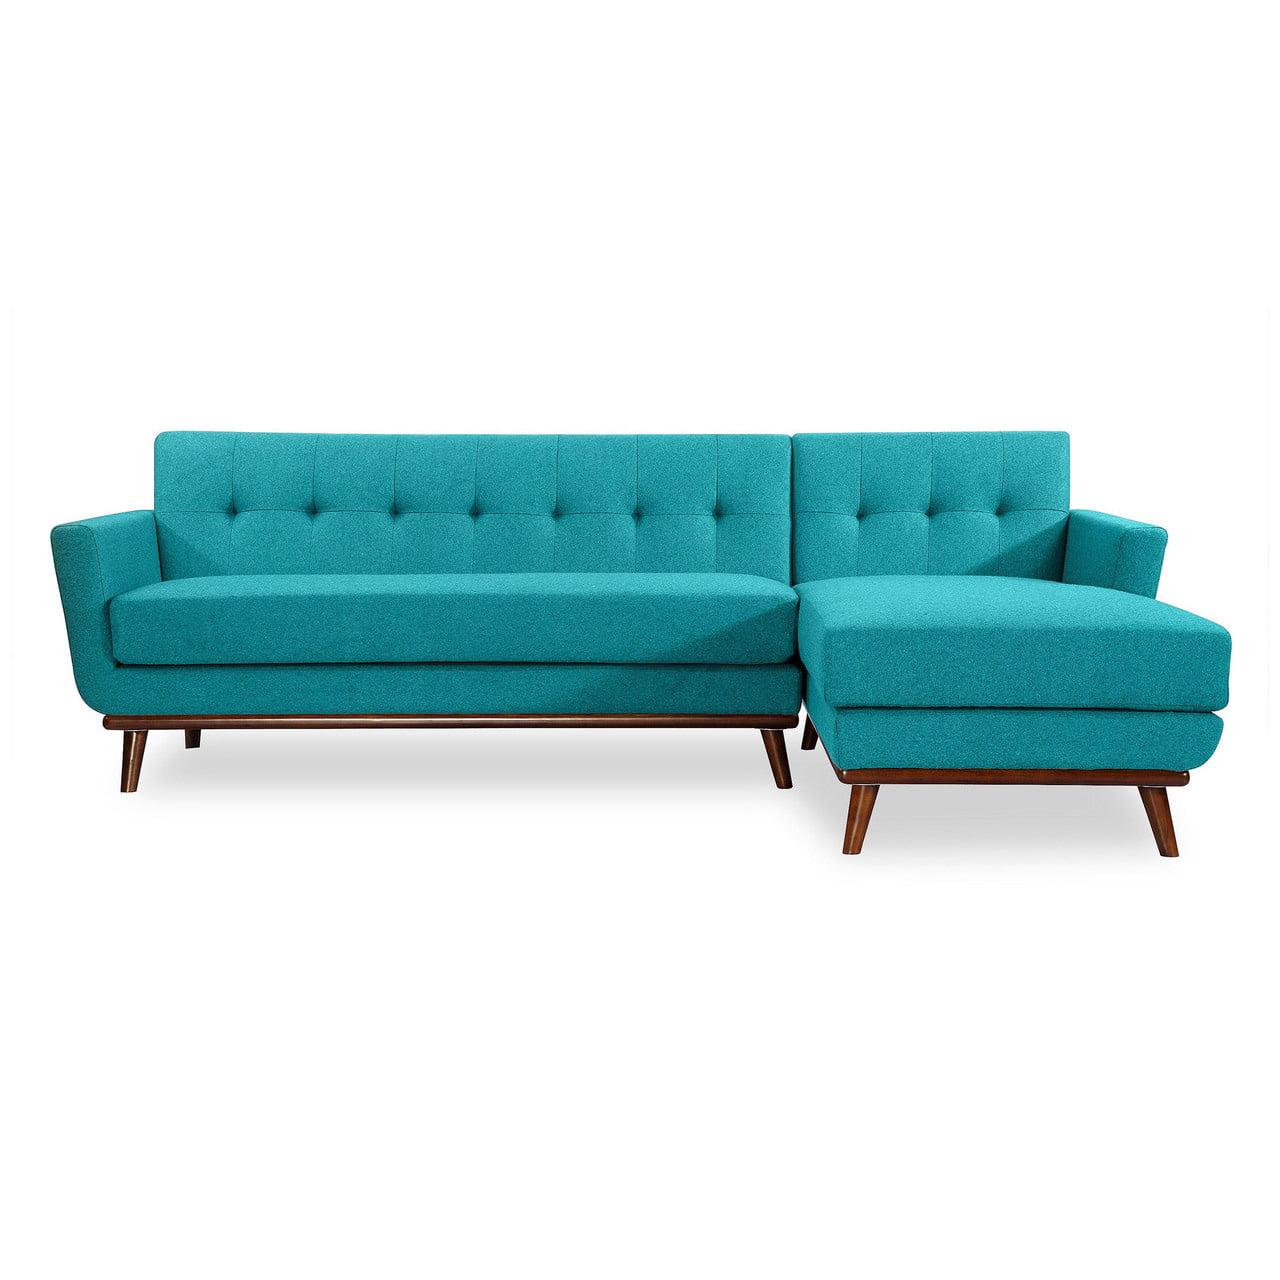 Kardiel Jackie Wool Hardwood Mid Century Modern Right Sectional Sofa